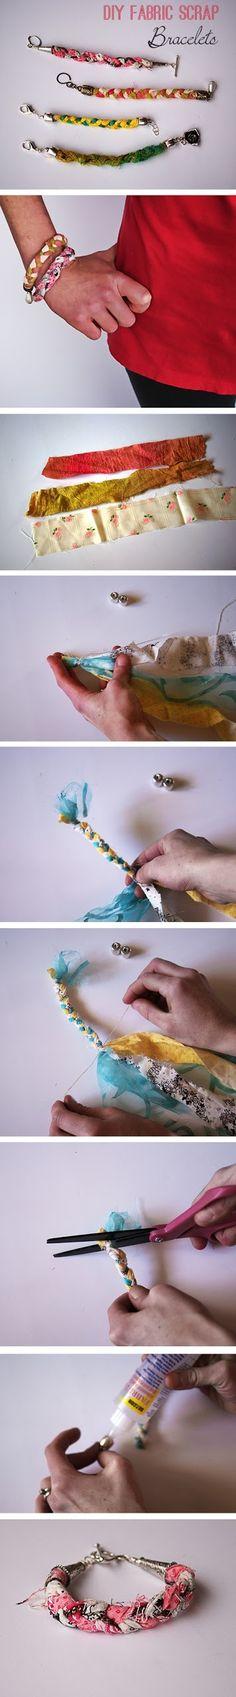 Diy : Easy Scrap Fabric Bracelet @Kristen Gray i found a solution!!!